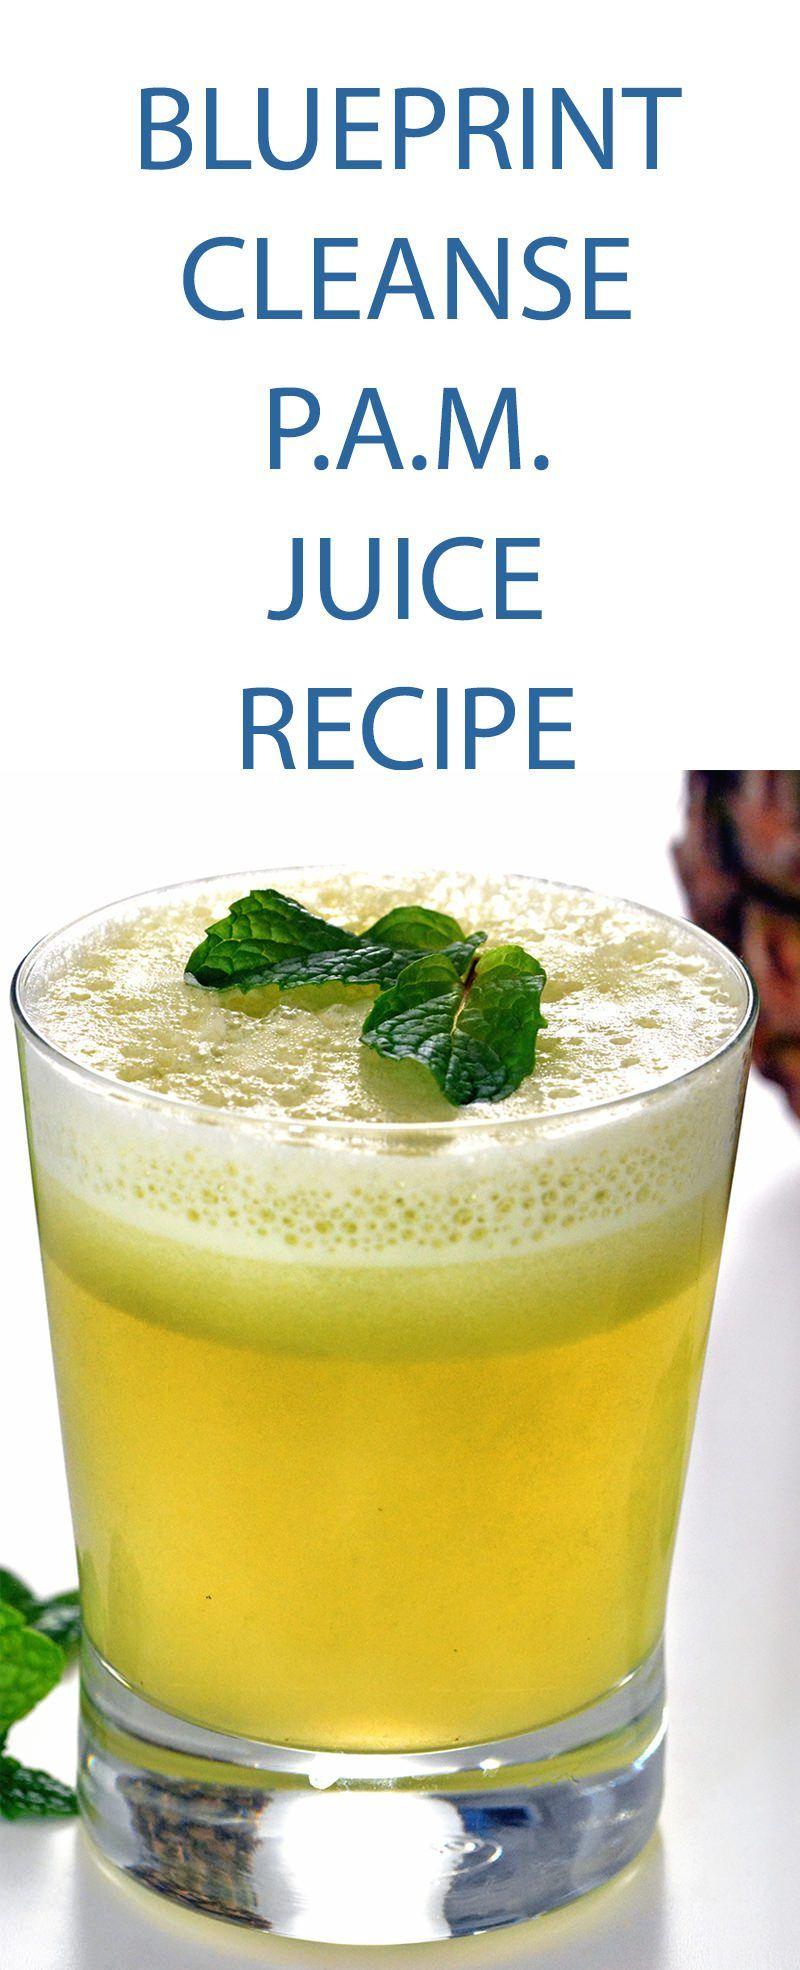 Blueprint cleanse juice recipe if youre looking for delicious blueprint cleanse juice recipe if youre looking for delicious and easy green juice malvernweather Gallery